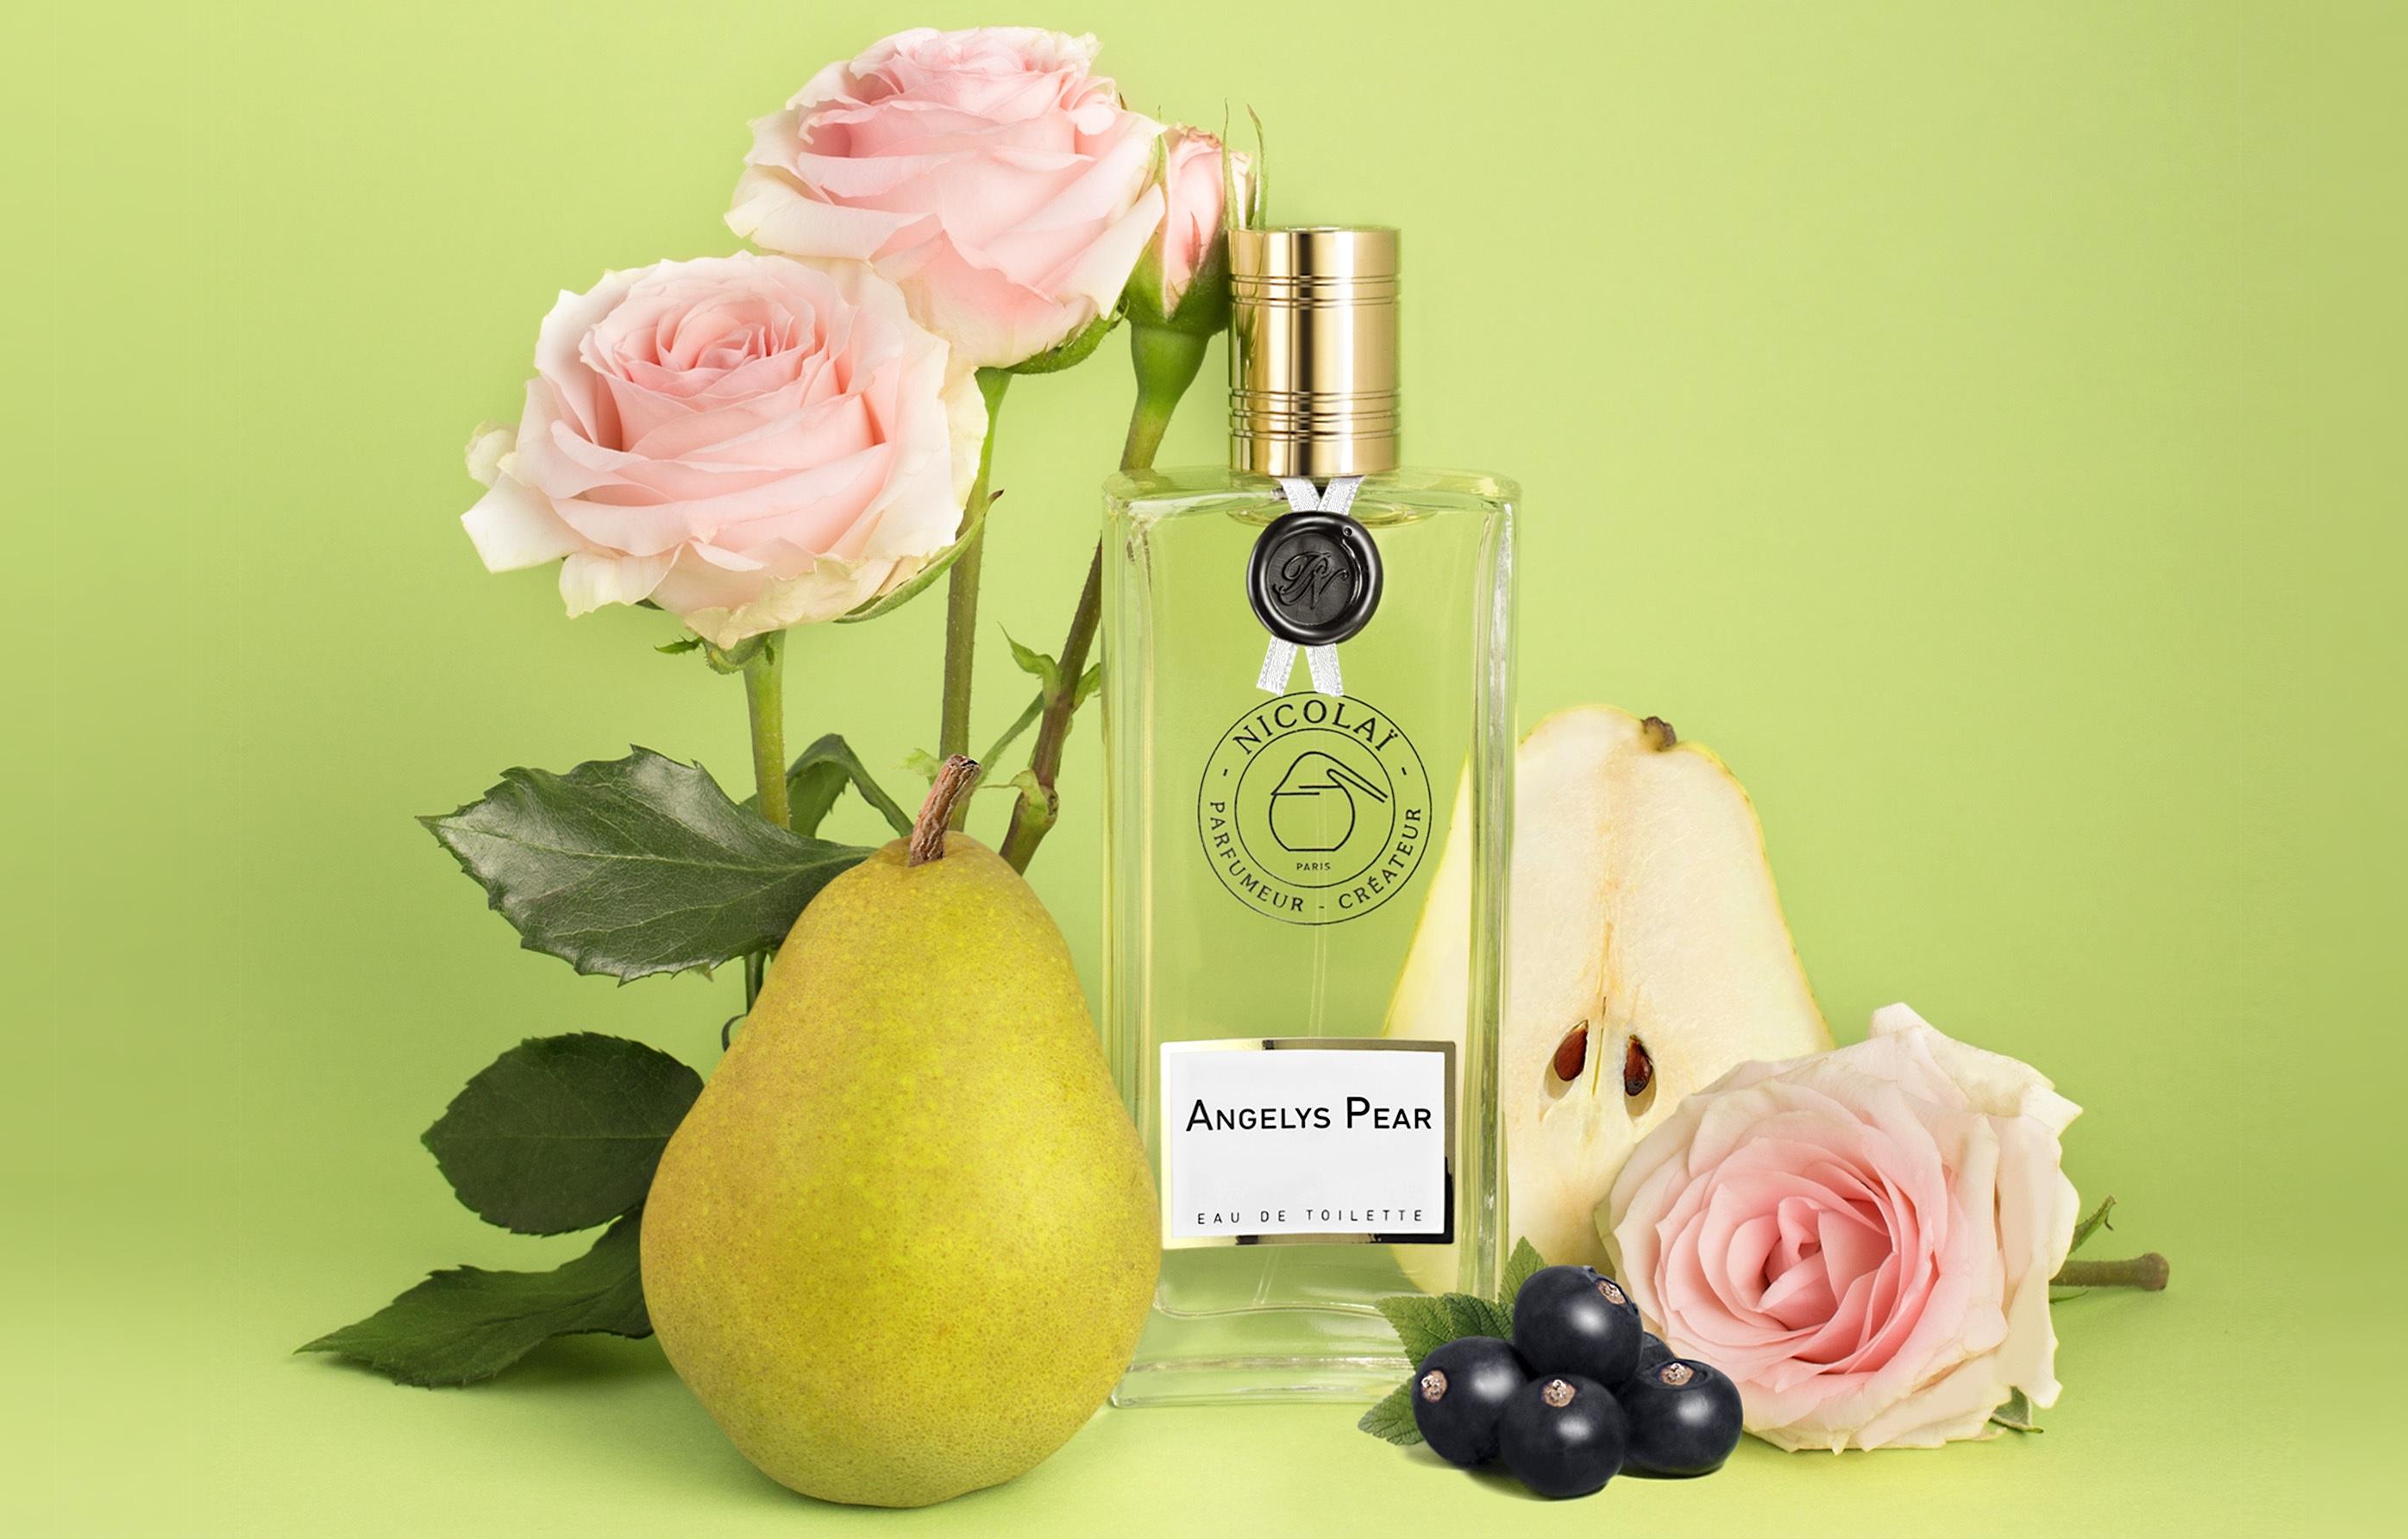 Nicolai Angelys Pear - perfumy gruszkowe